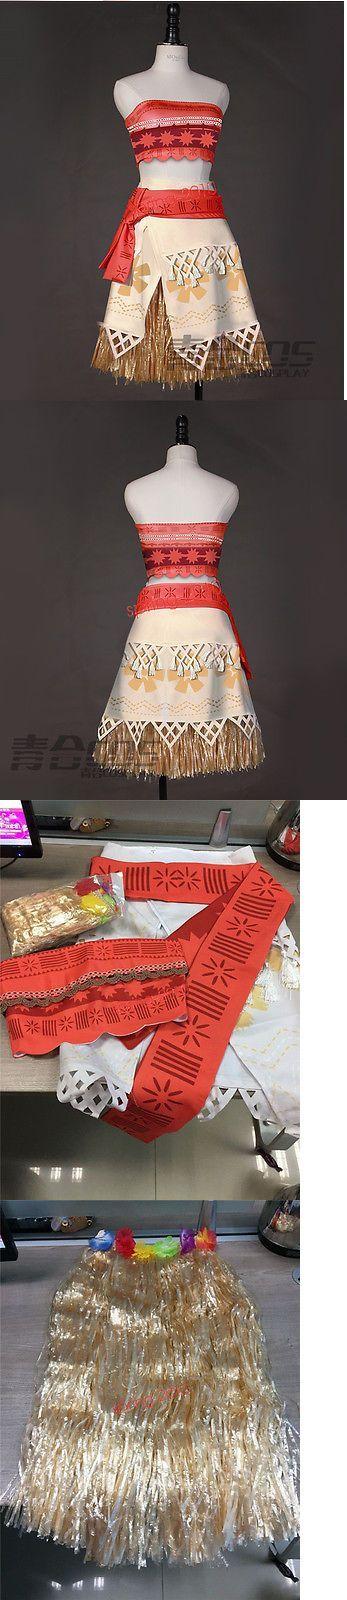 Halloween Costumes Women: New Movie Moana Costume Princess Dress Skirt Halloween Cosplay BUY IT NOW ONLY: $45.99